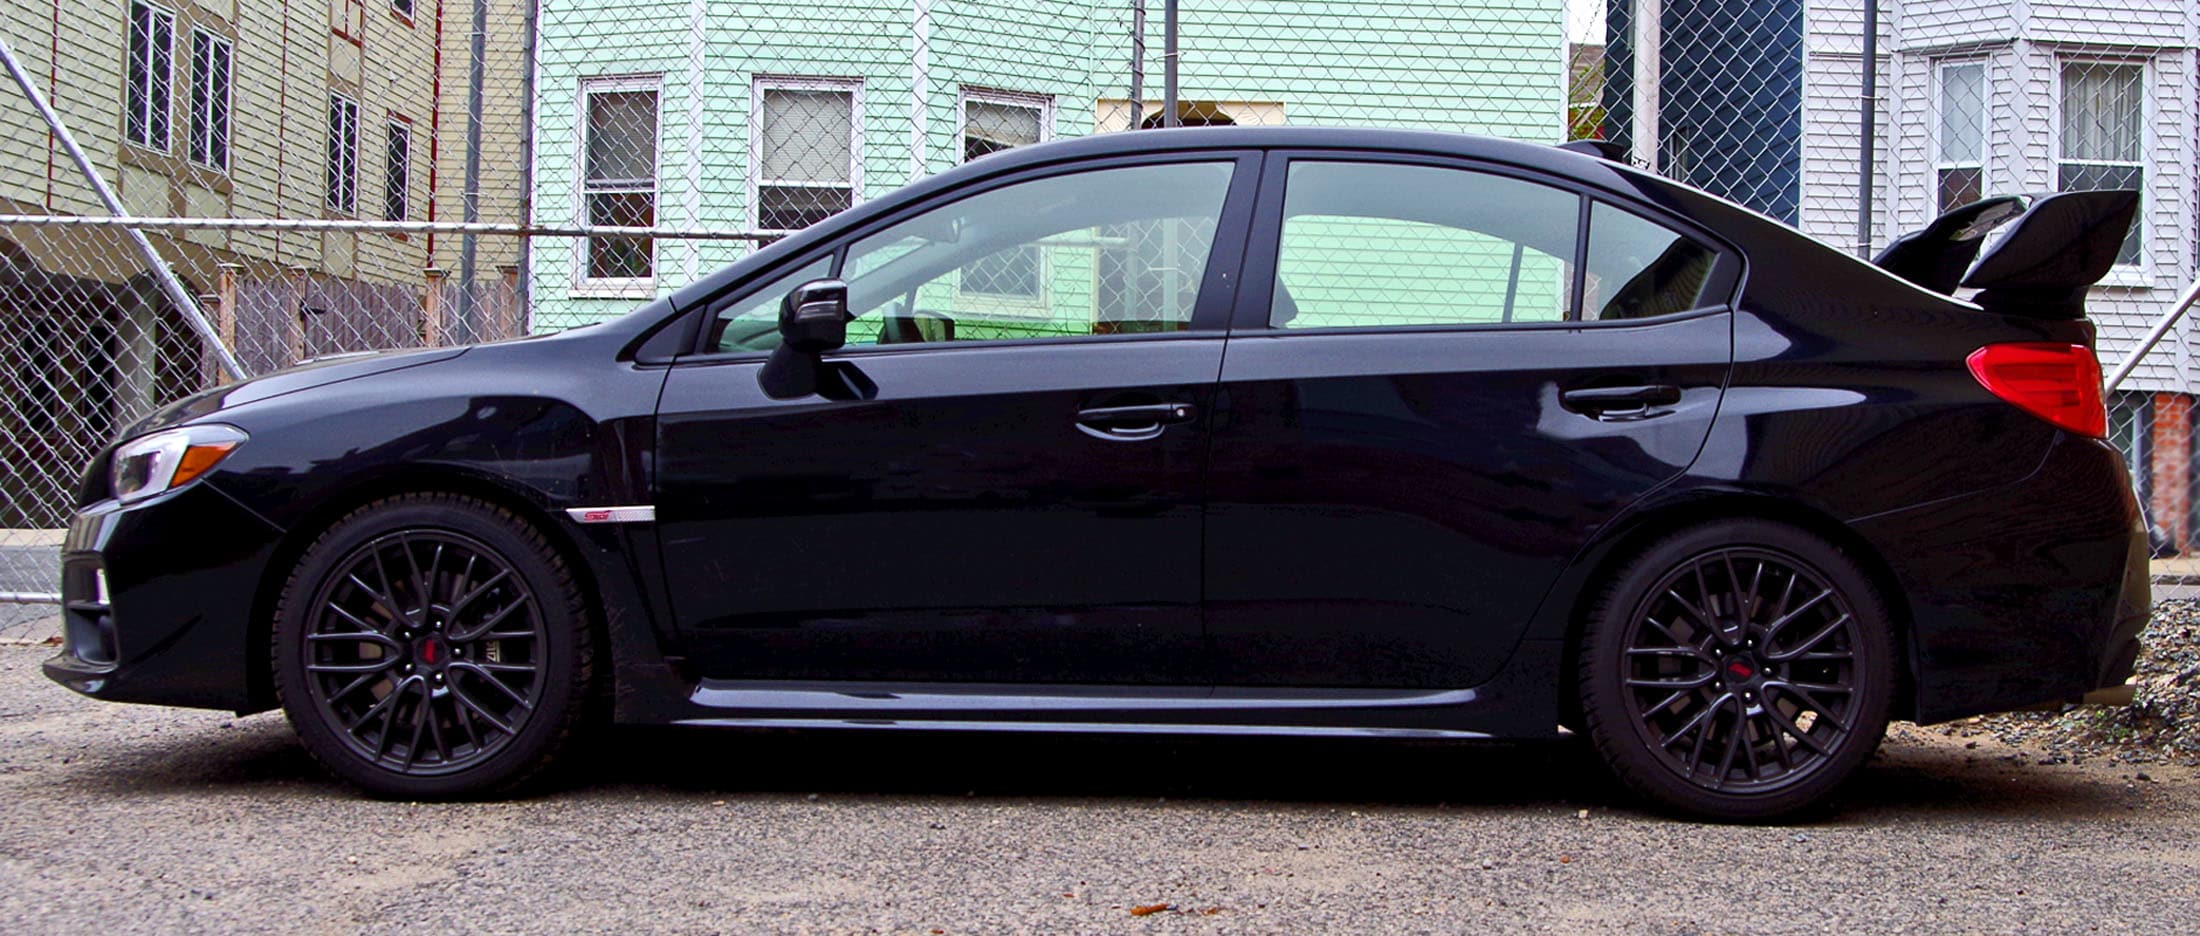 Side view, 2015 Subaru WRX STI